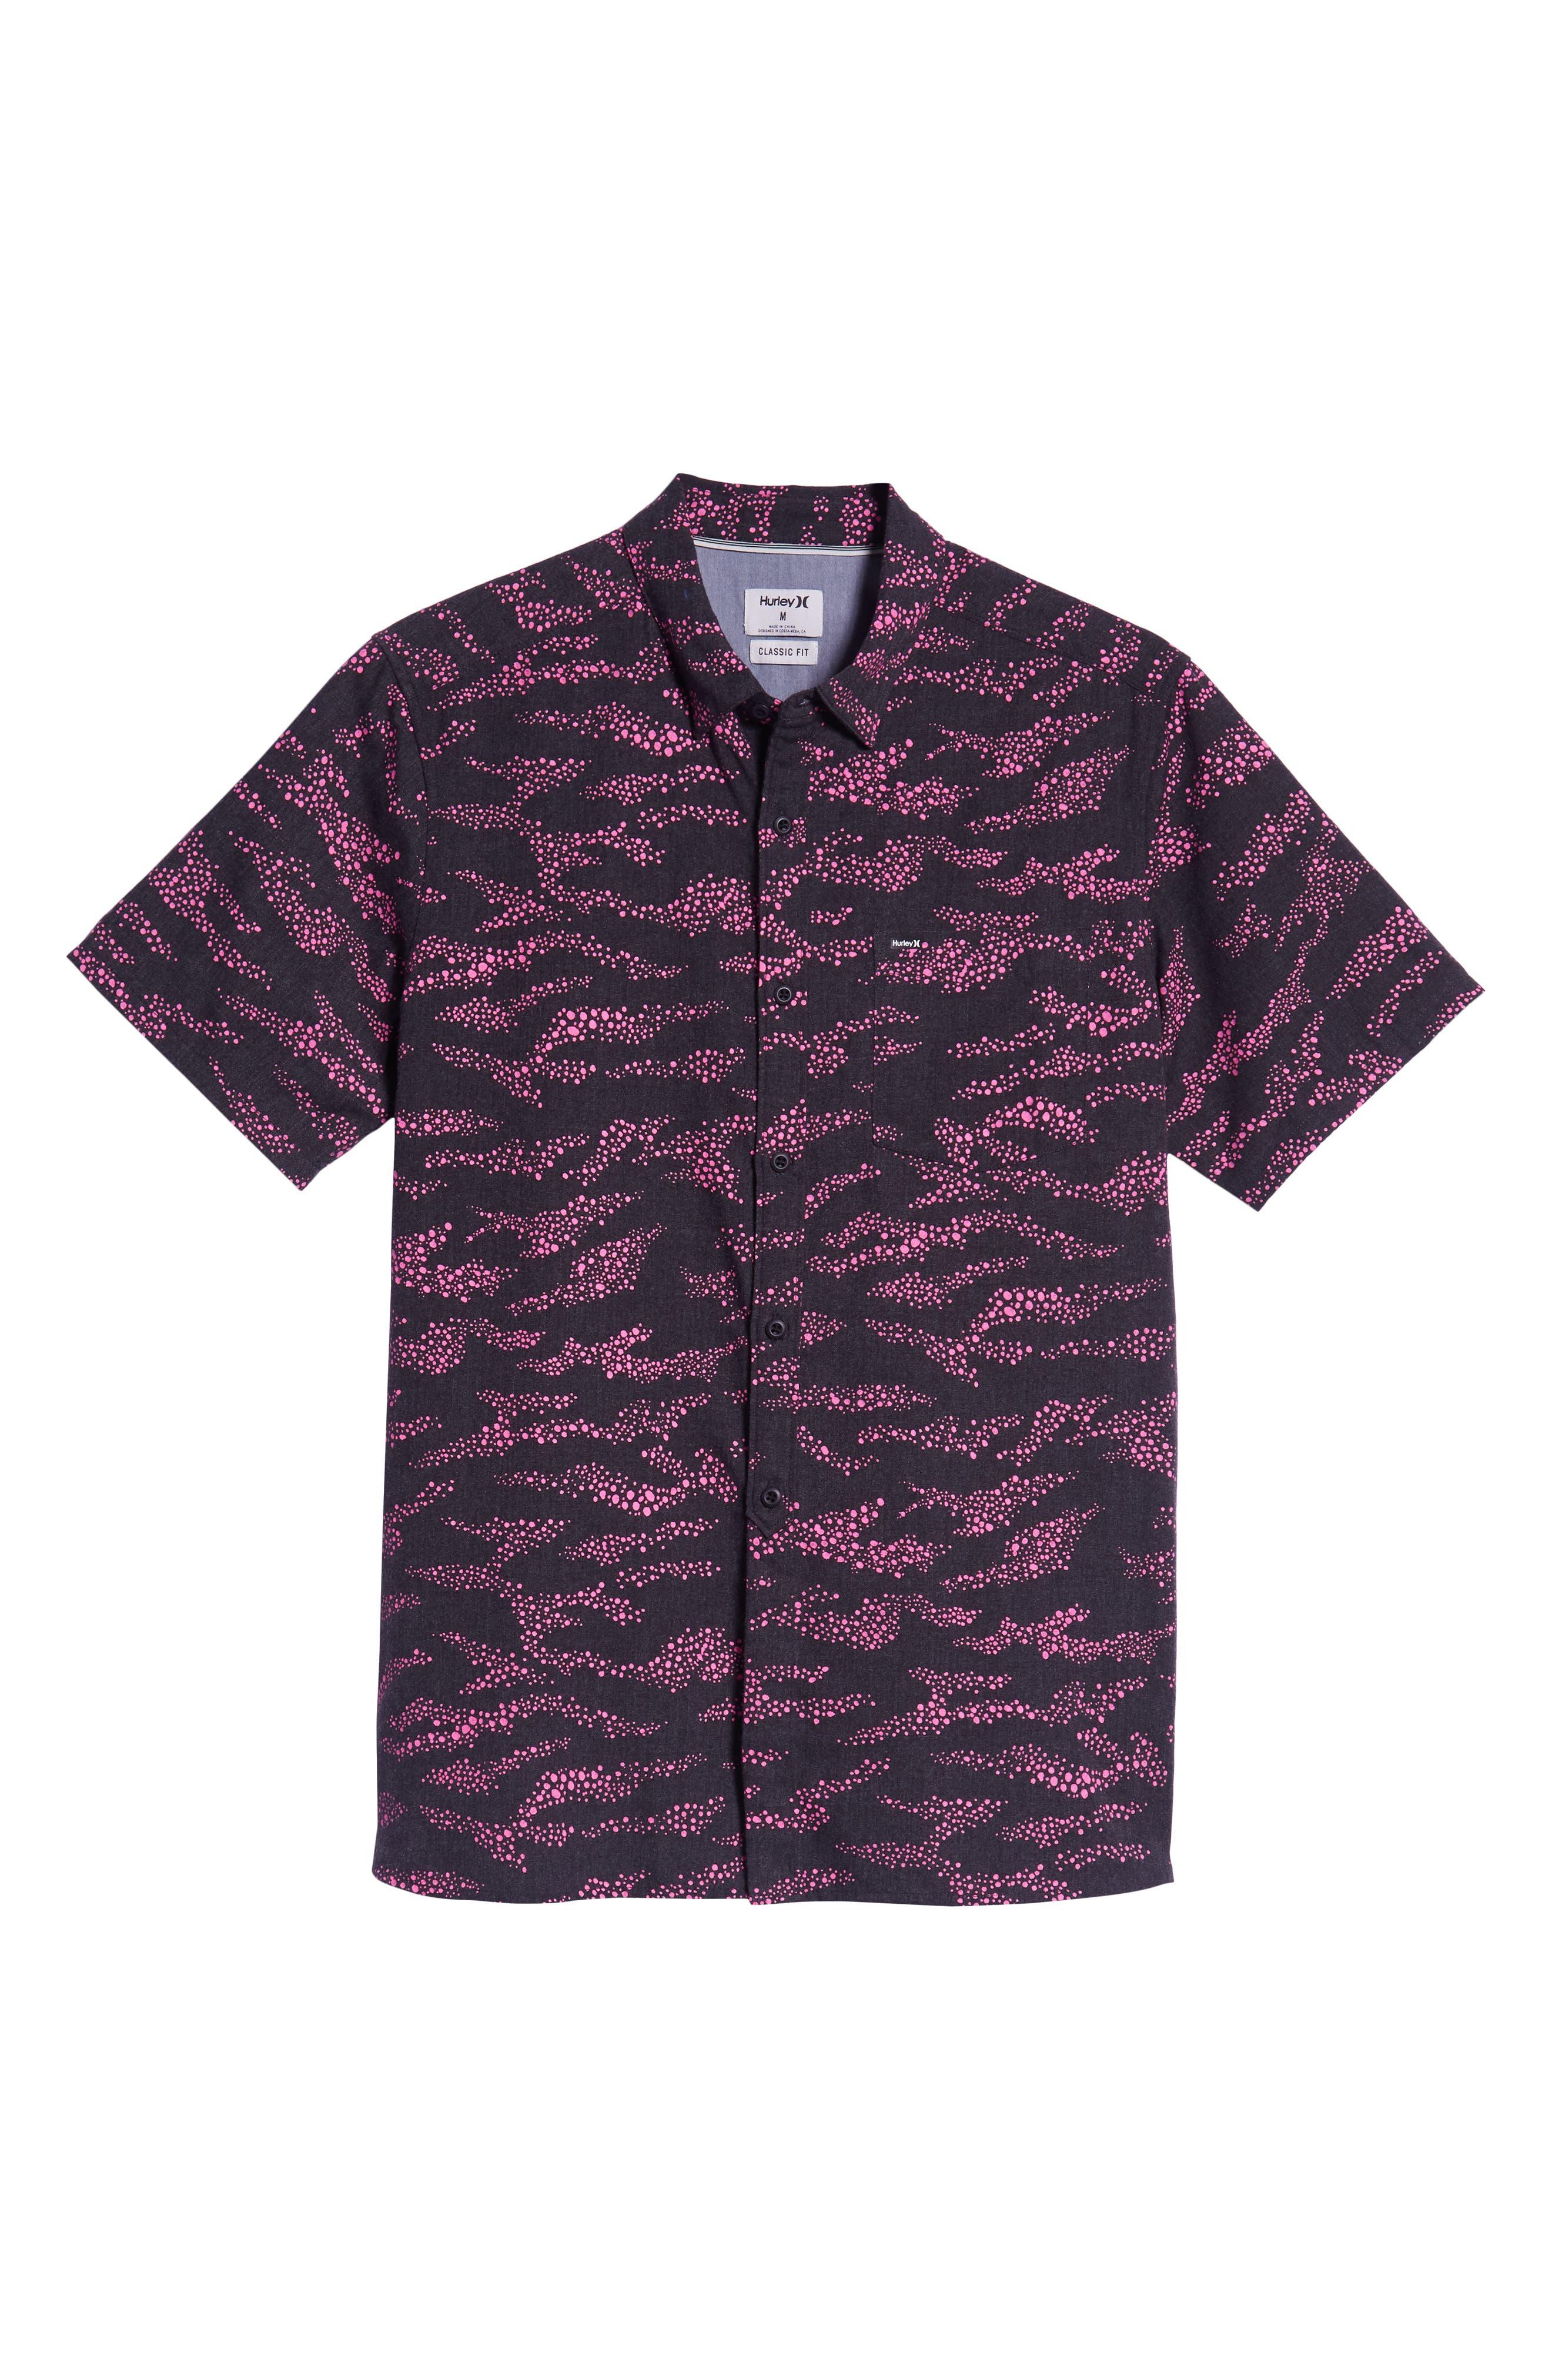 Outcast Woven Shirt,                             Alternate thumbnail 5, color,                             BLACK HEATHER